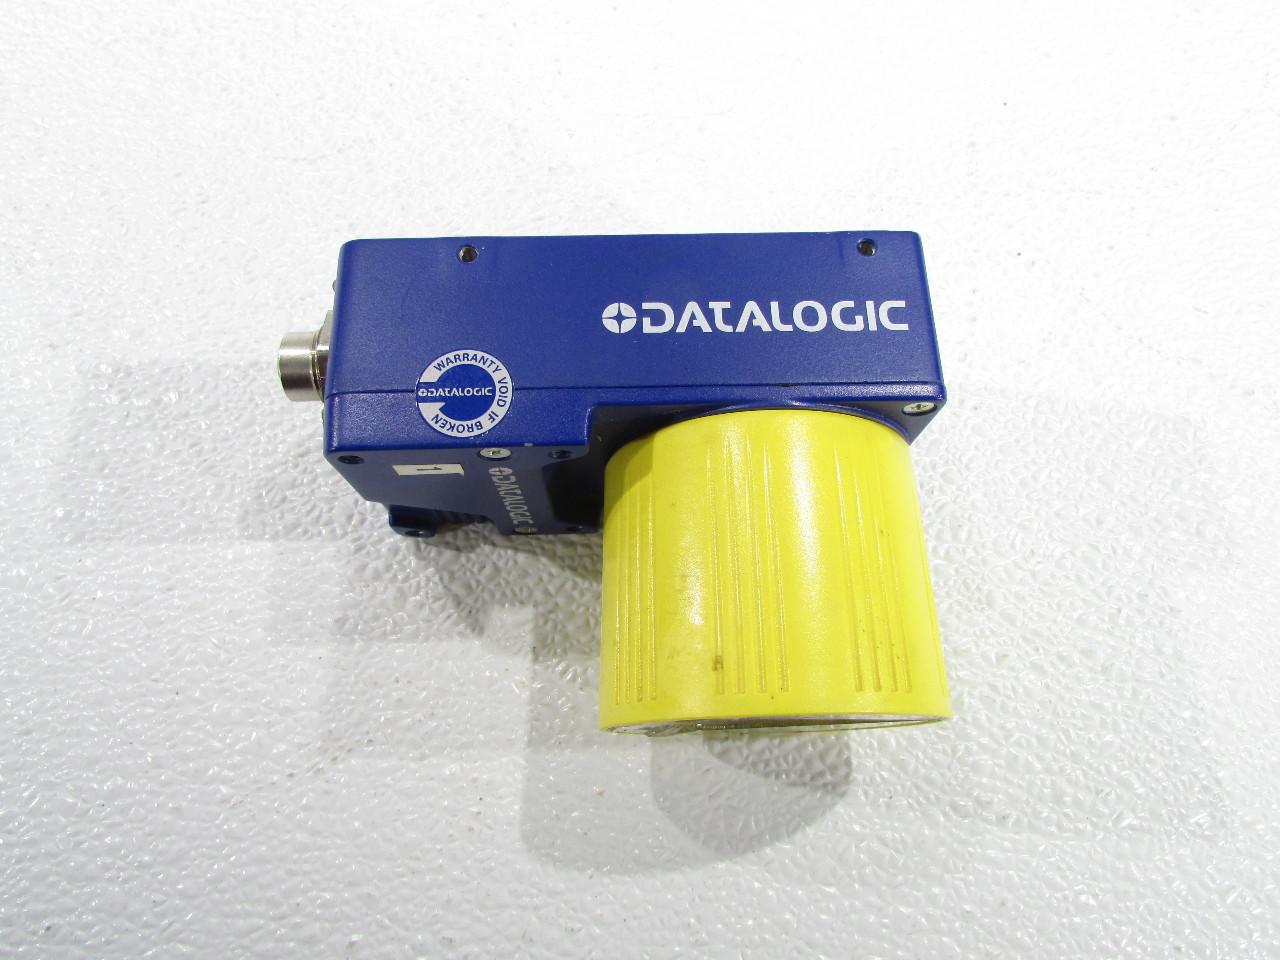 Diagram Symbols House Electrical Wiring Diagram Software Friv 5